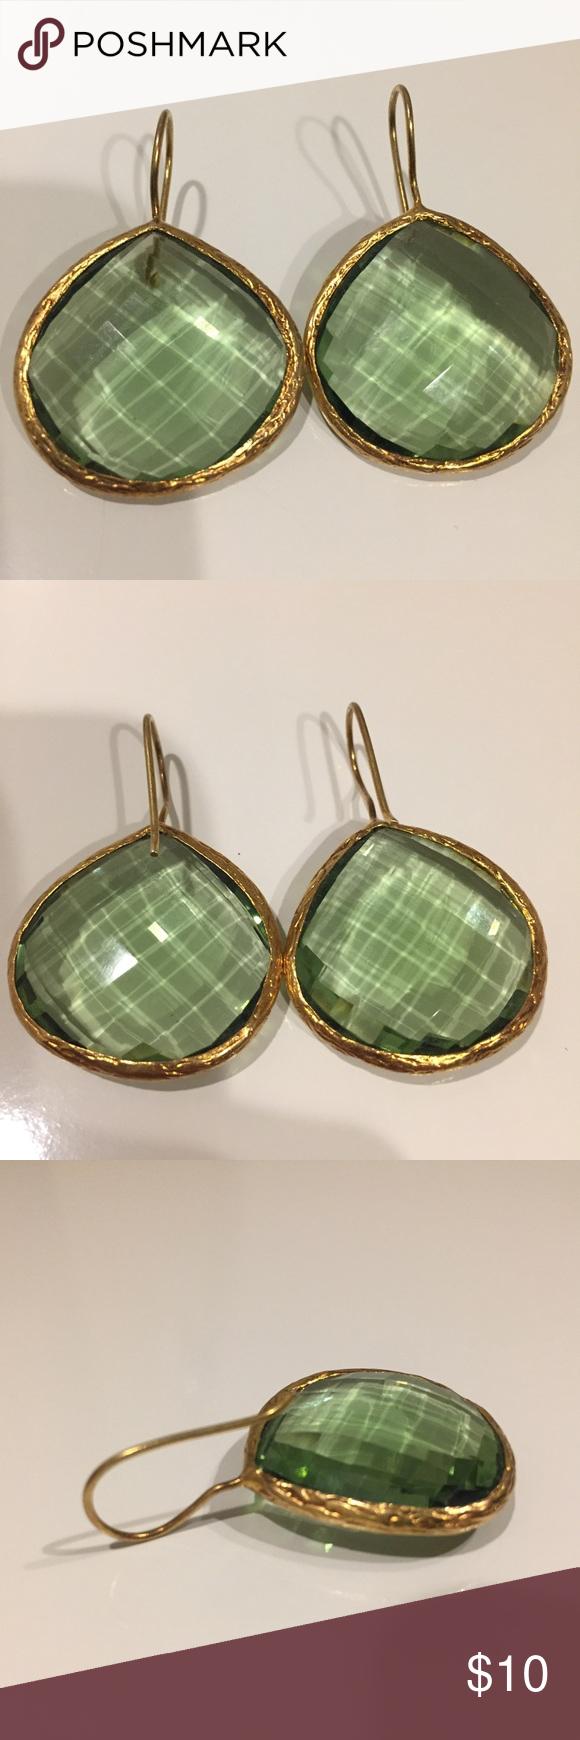 Beautiful green stone earrings